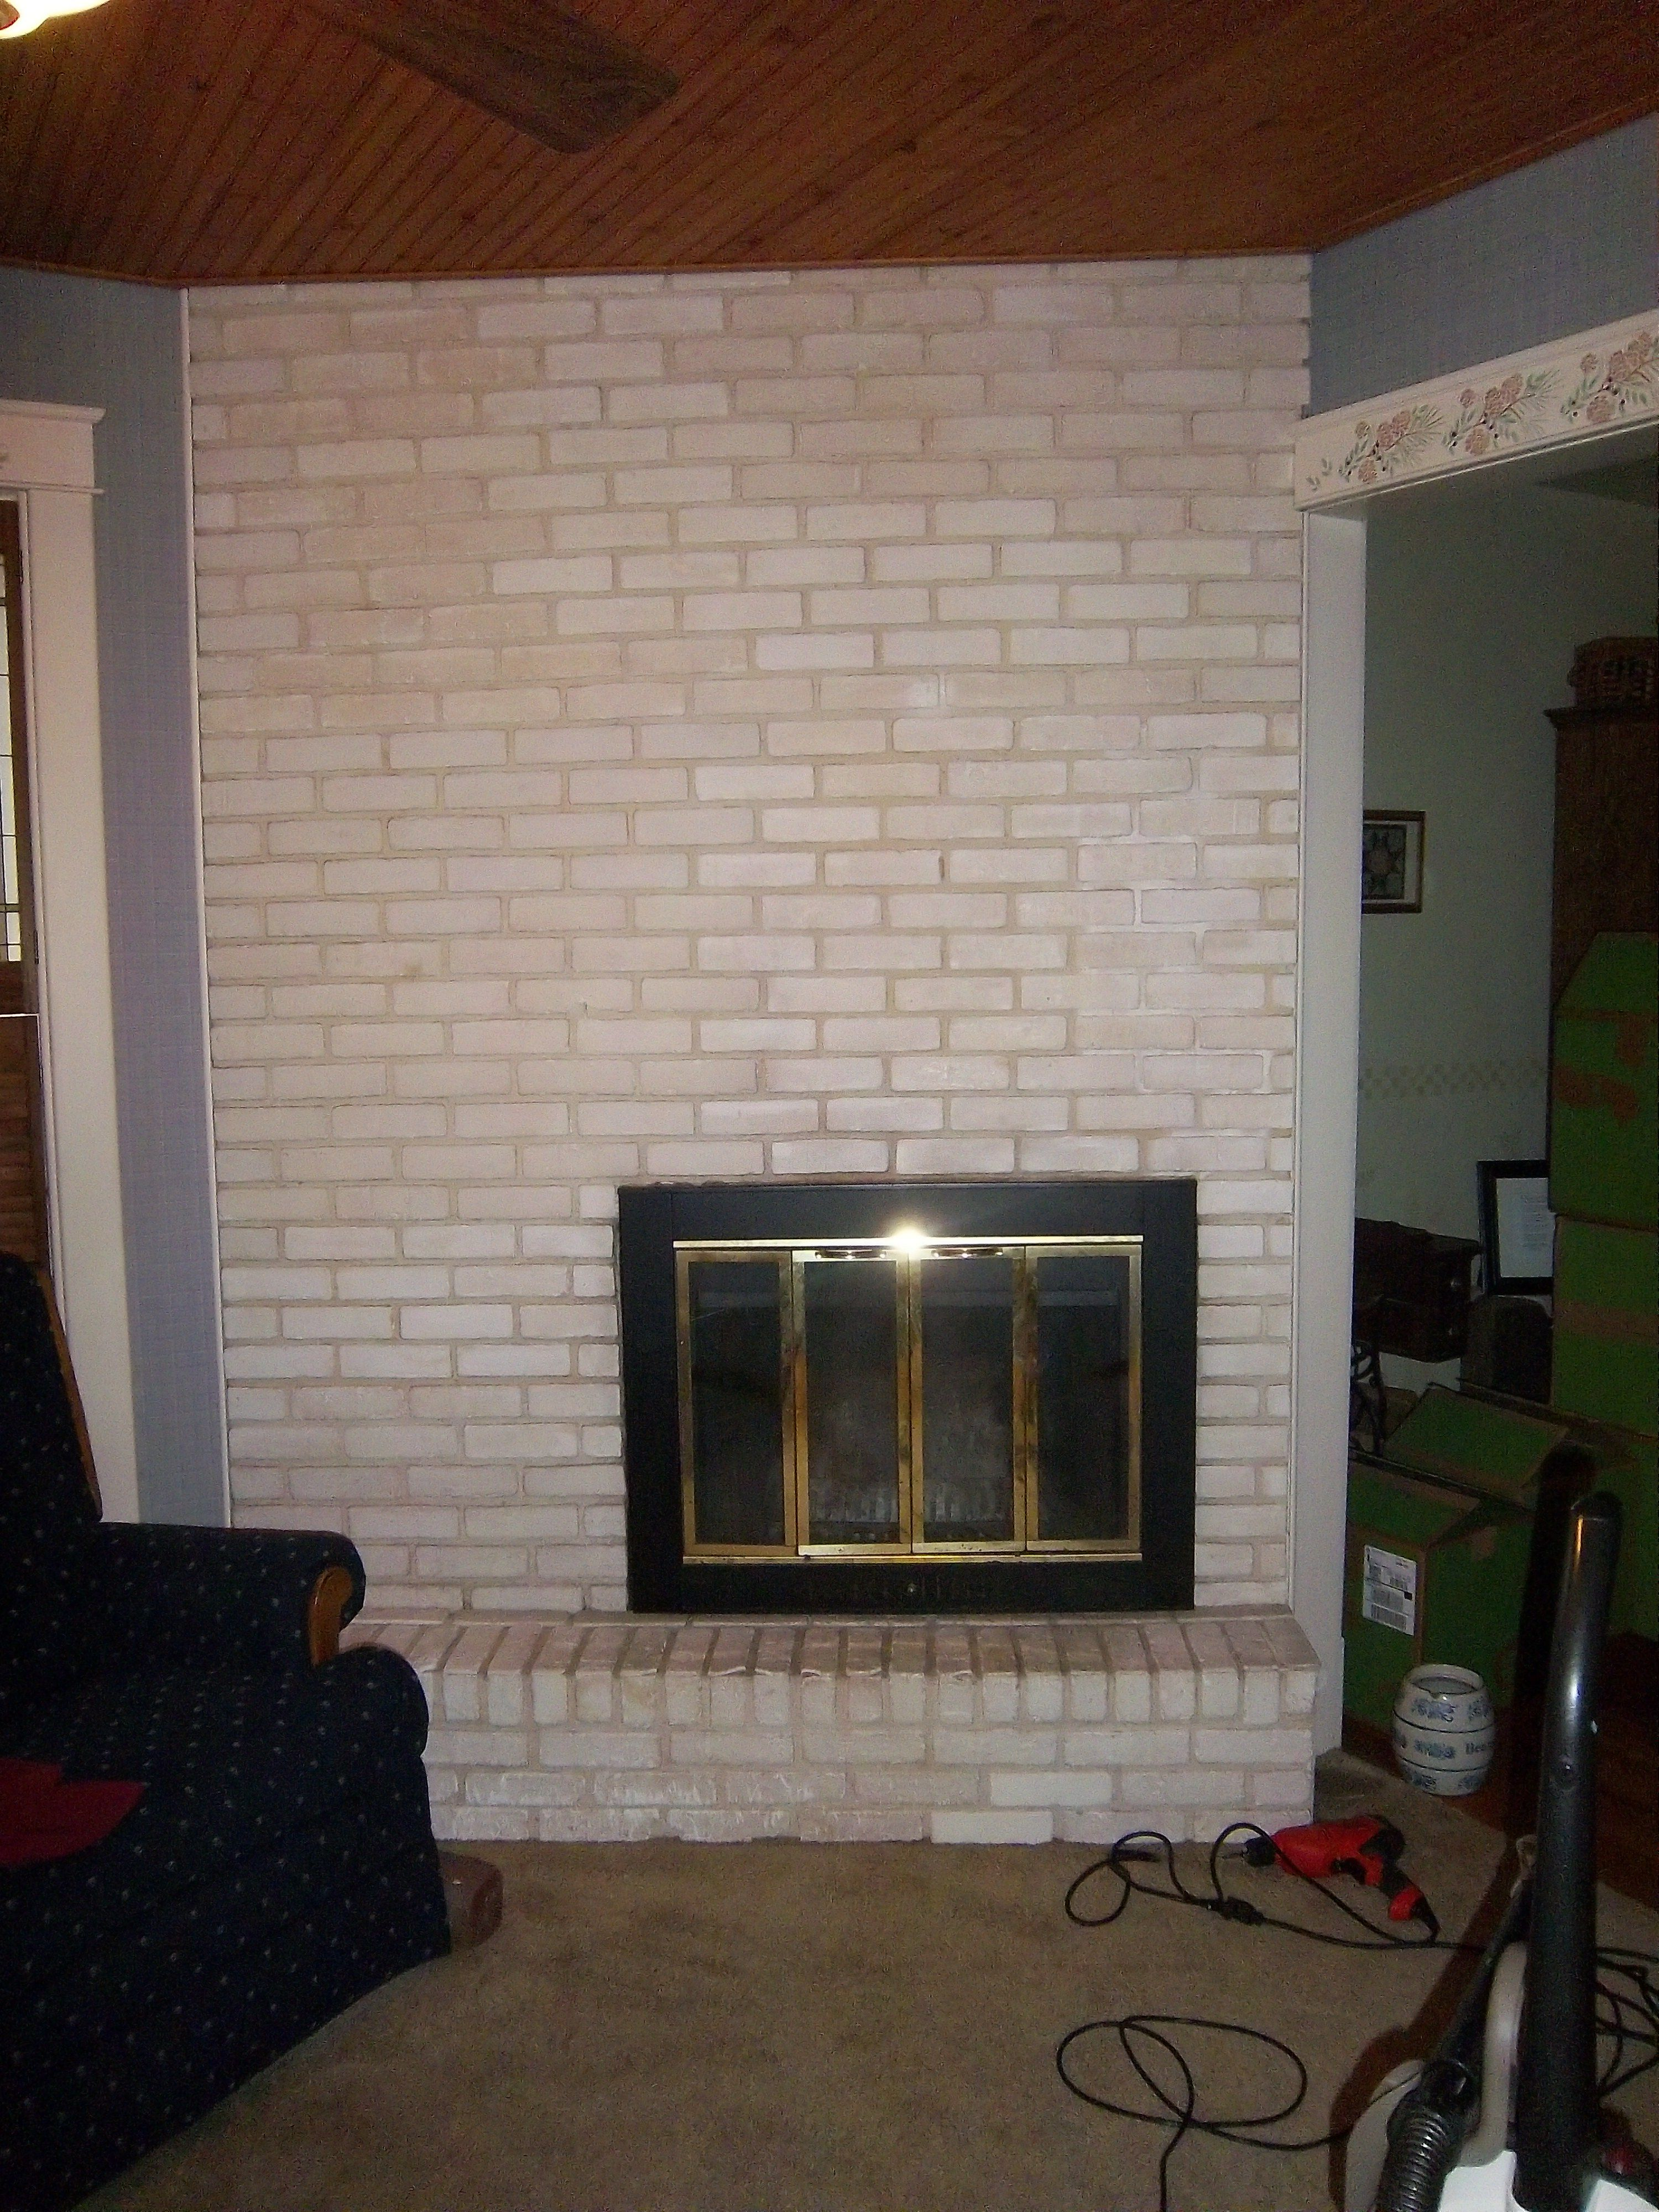 White fake brick fireplace, just beginning to repaint ...